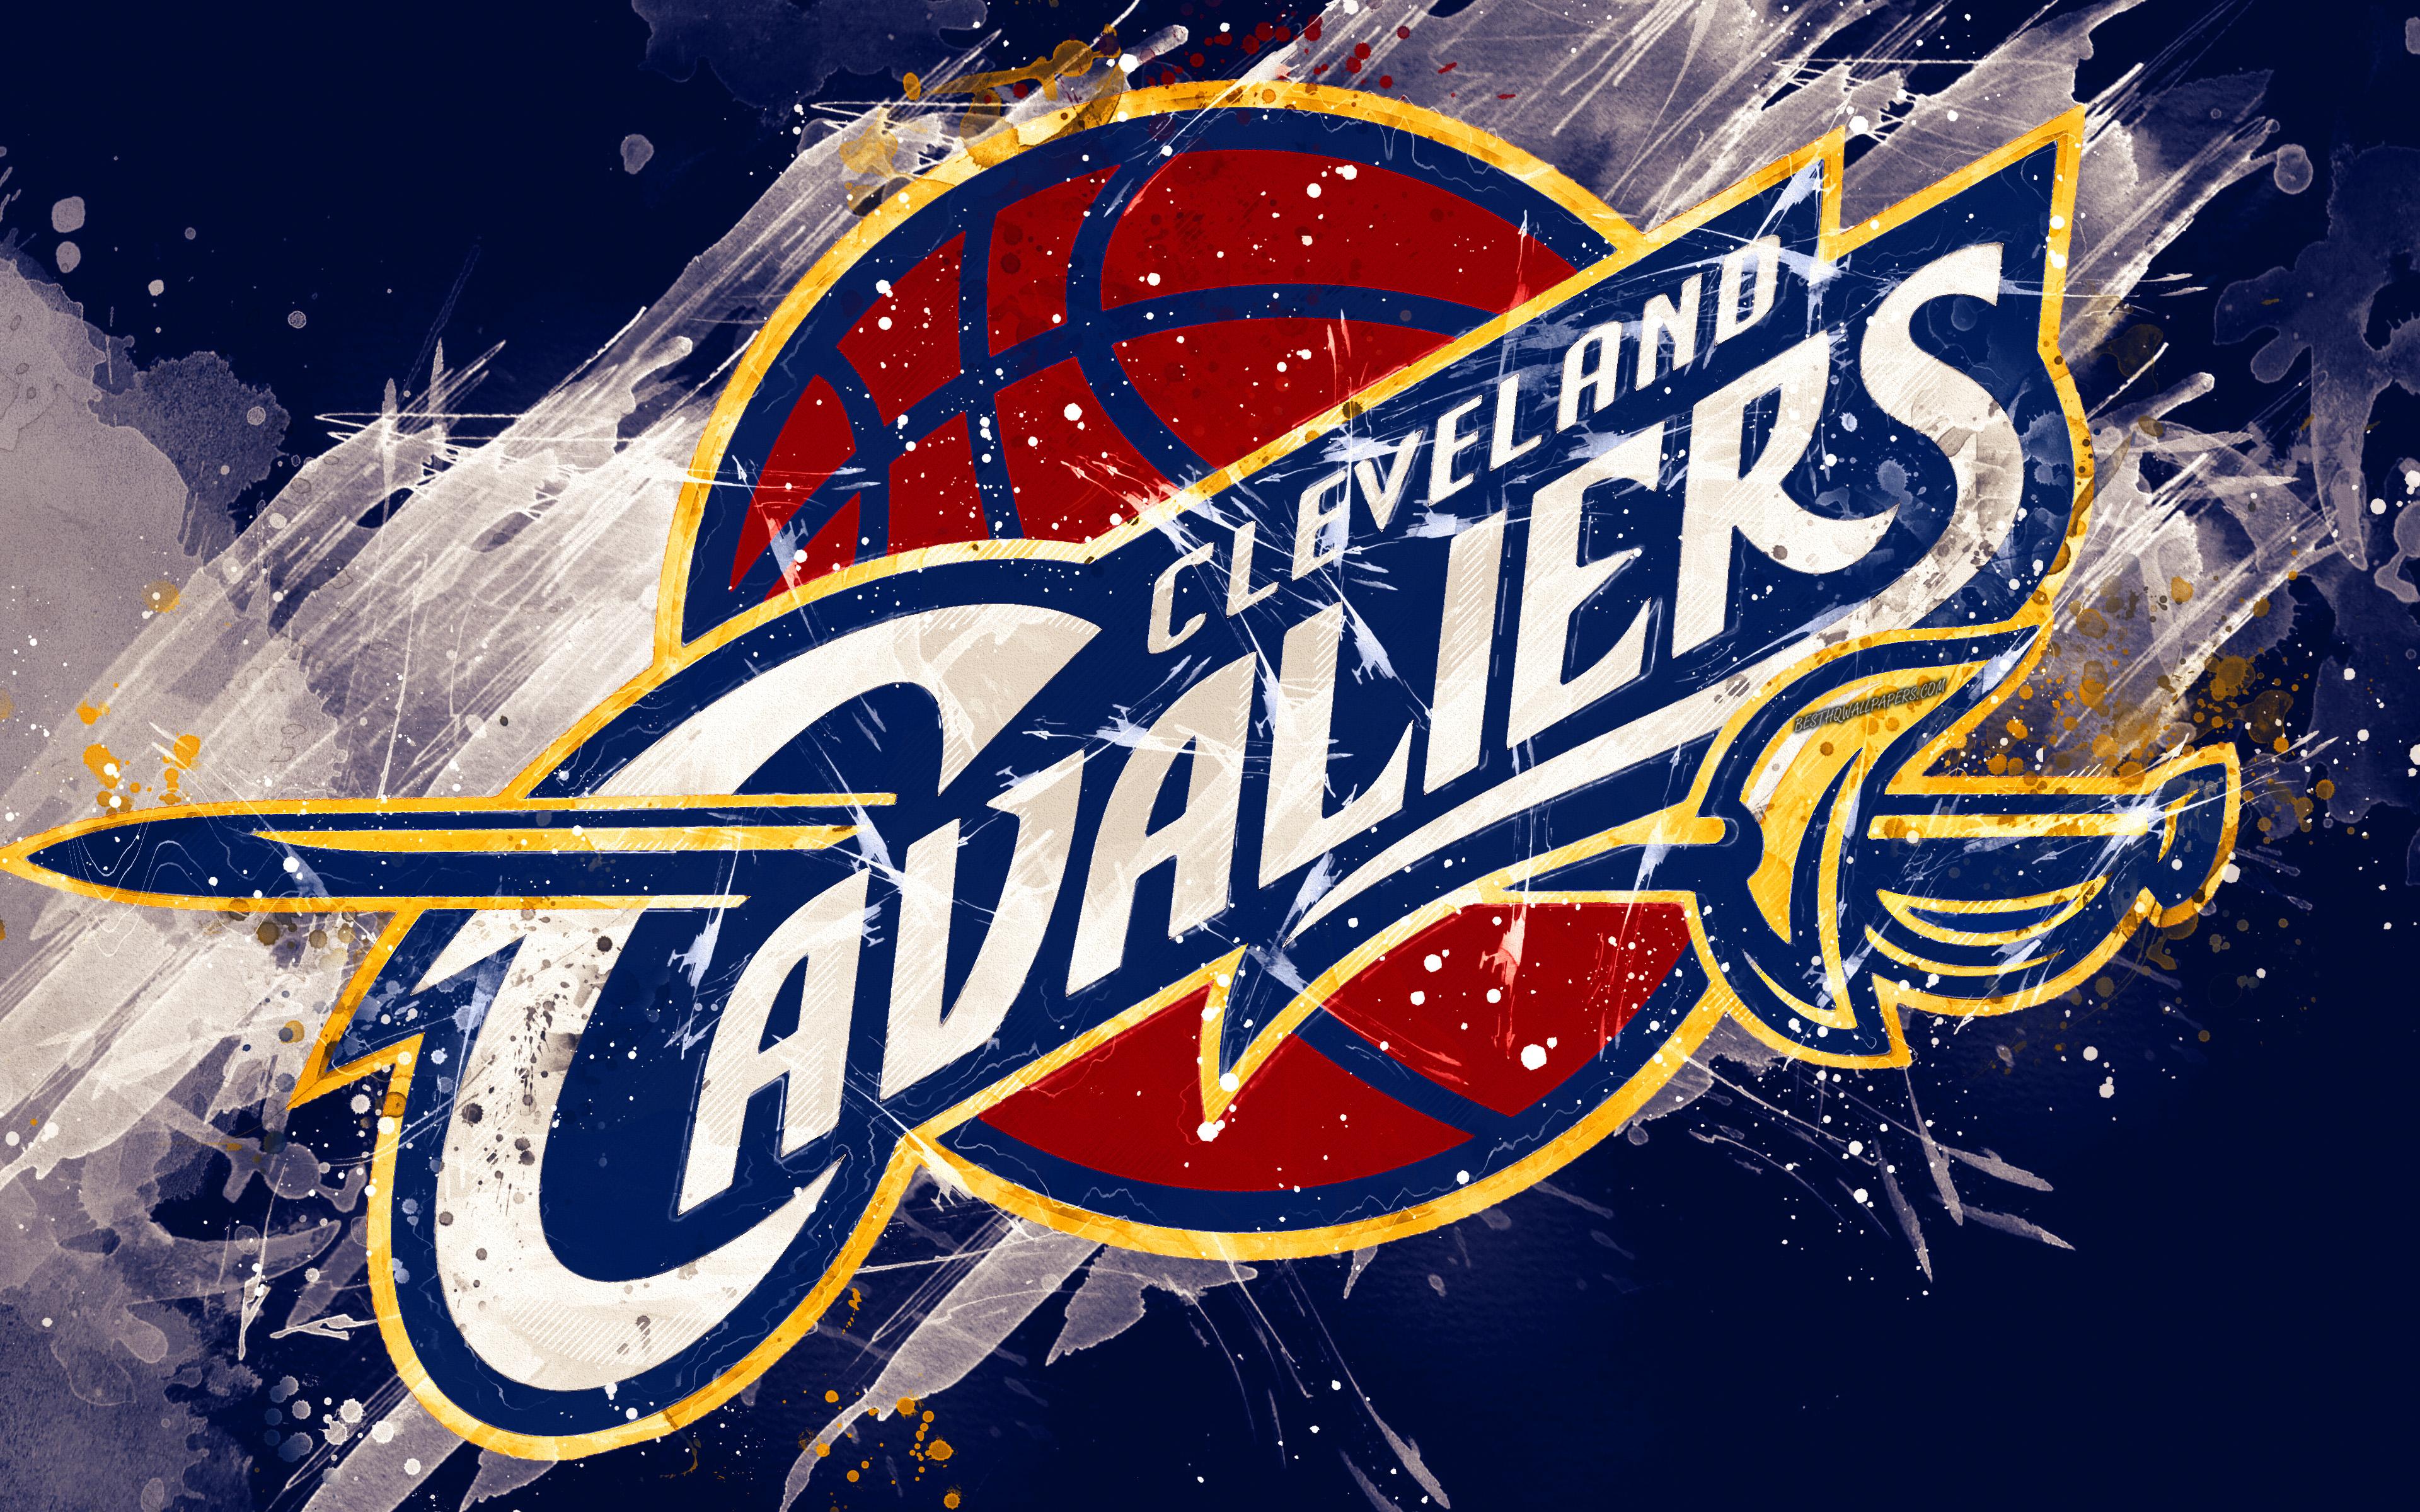 Cleveland Cavaliers Logo 4k Ultra HD